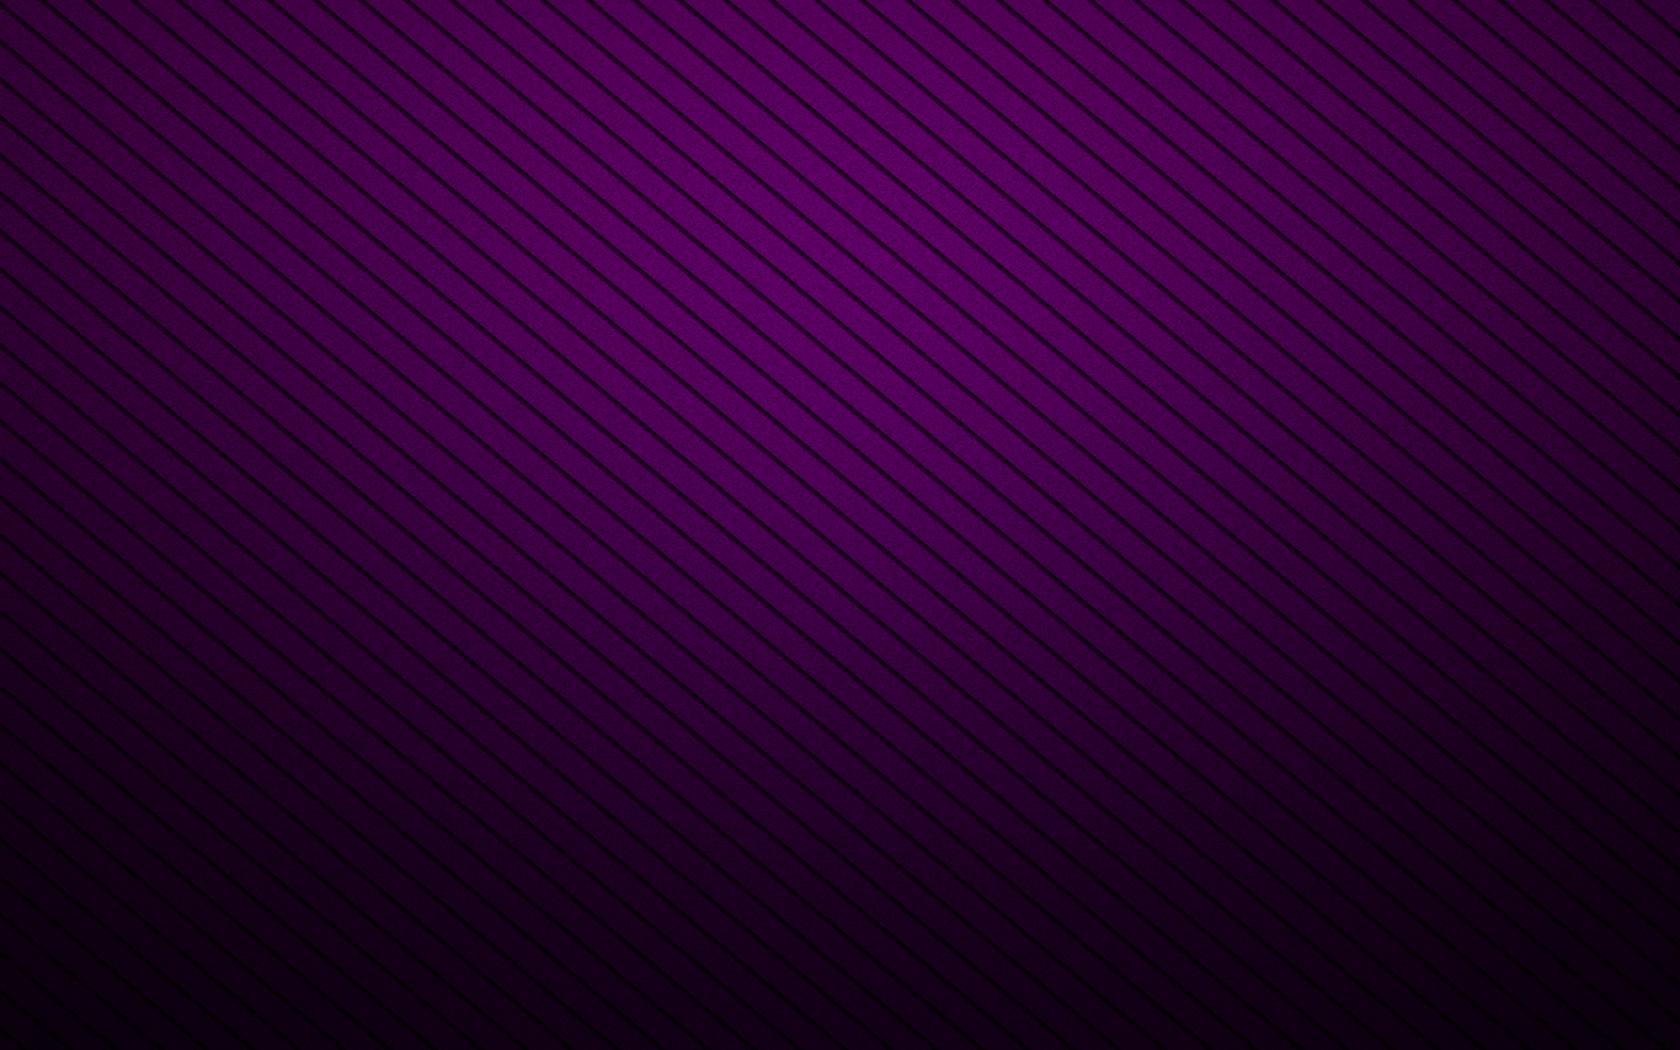 Purple Stripes Wallpaper 1680x1050 Purple Stripes 1680x1050